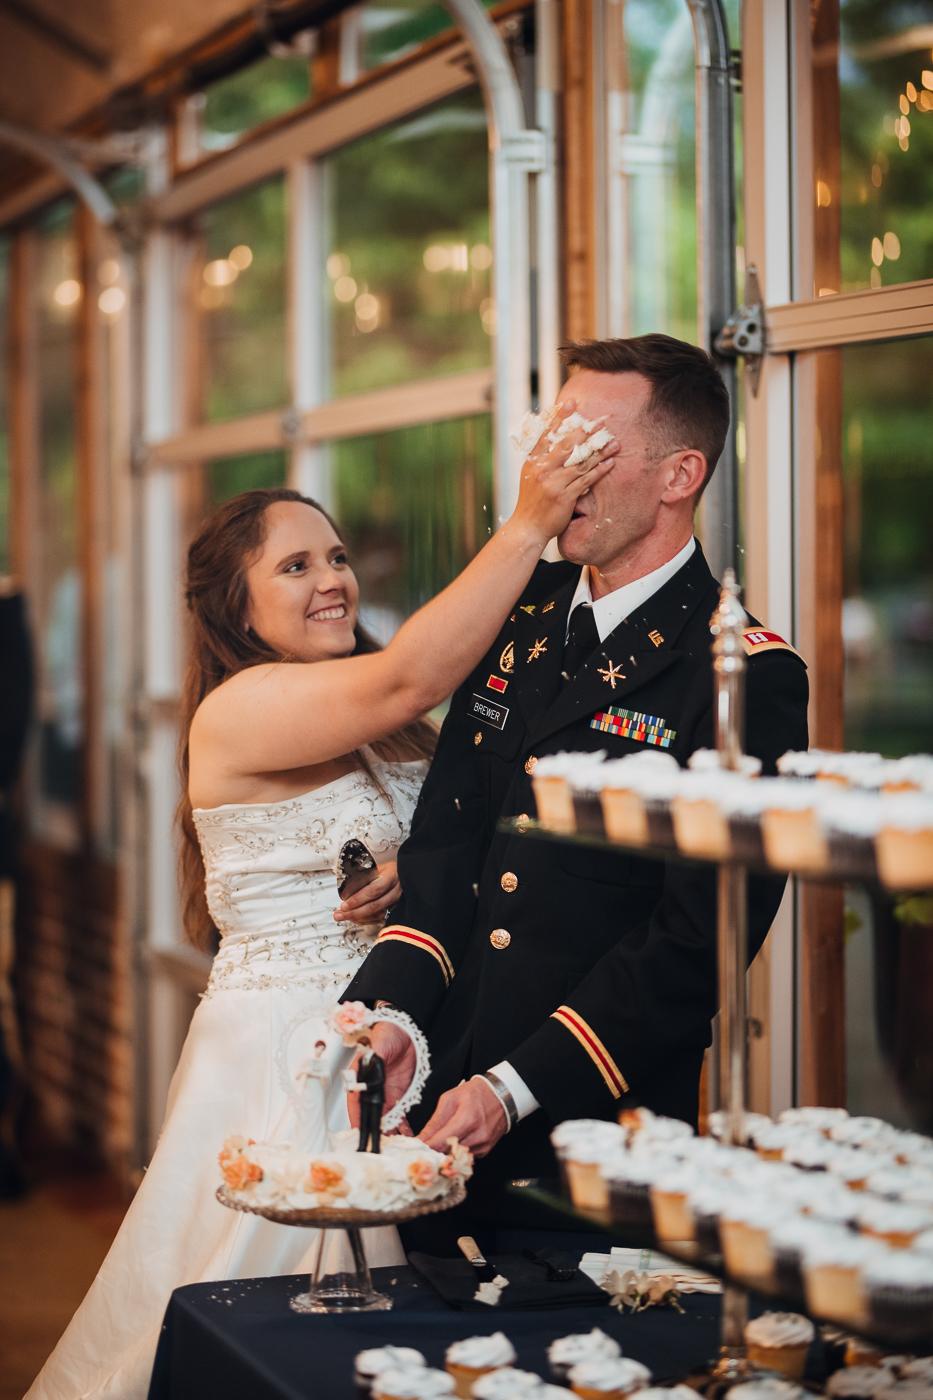 PHOCO Wedding Photography Brookside Gardens Berthoud Colorado Spring Julia Matt-19.jpg